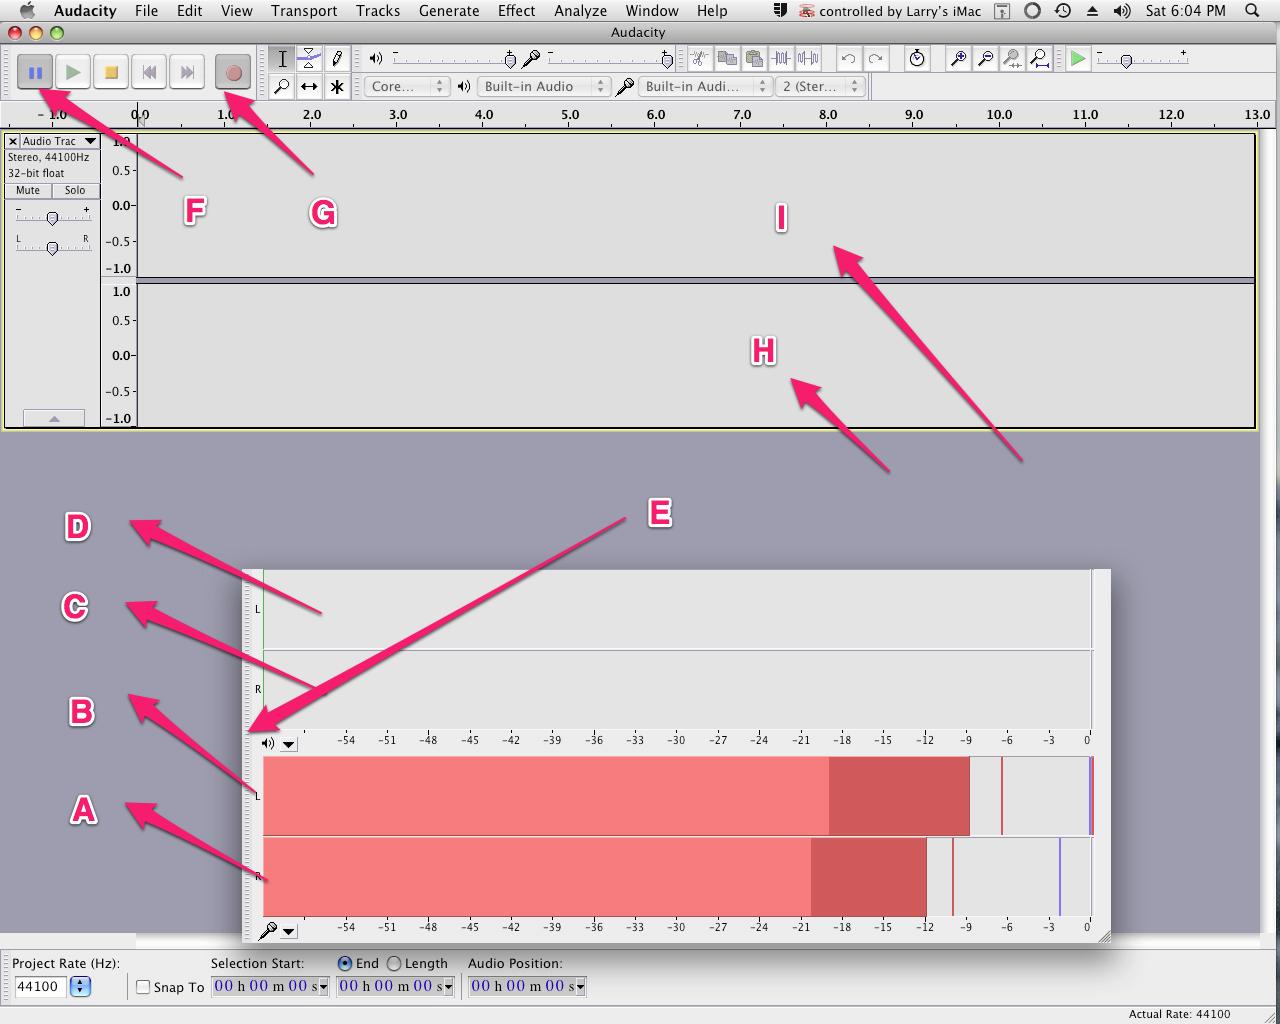 Audacity Window component break-out